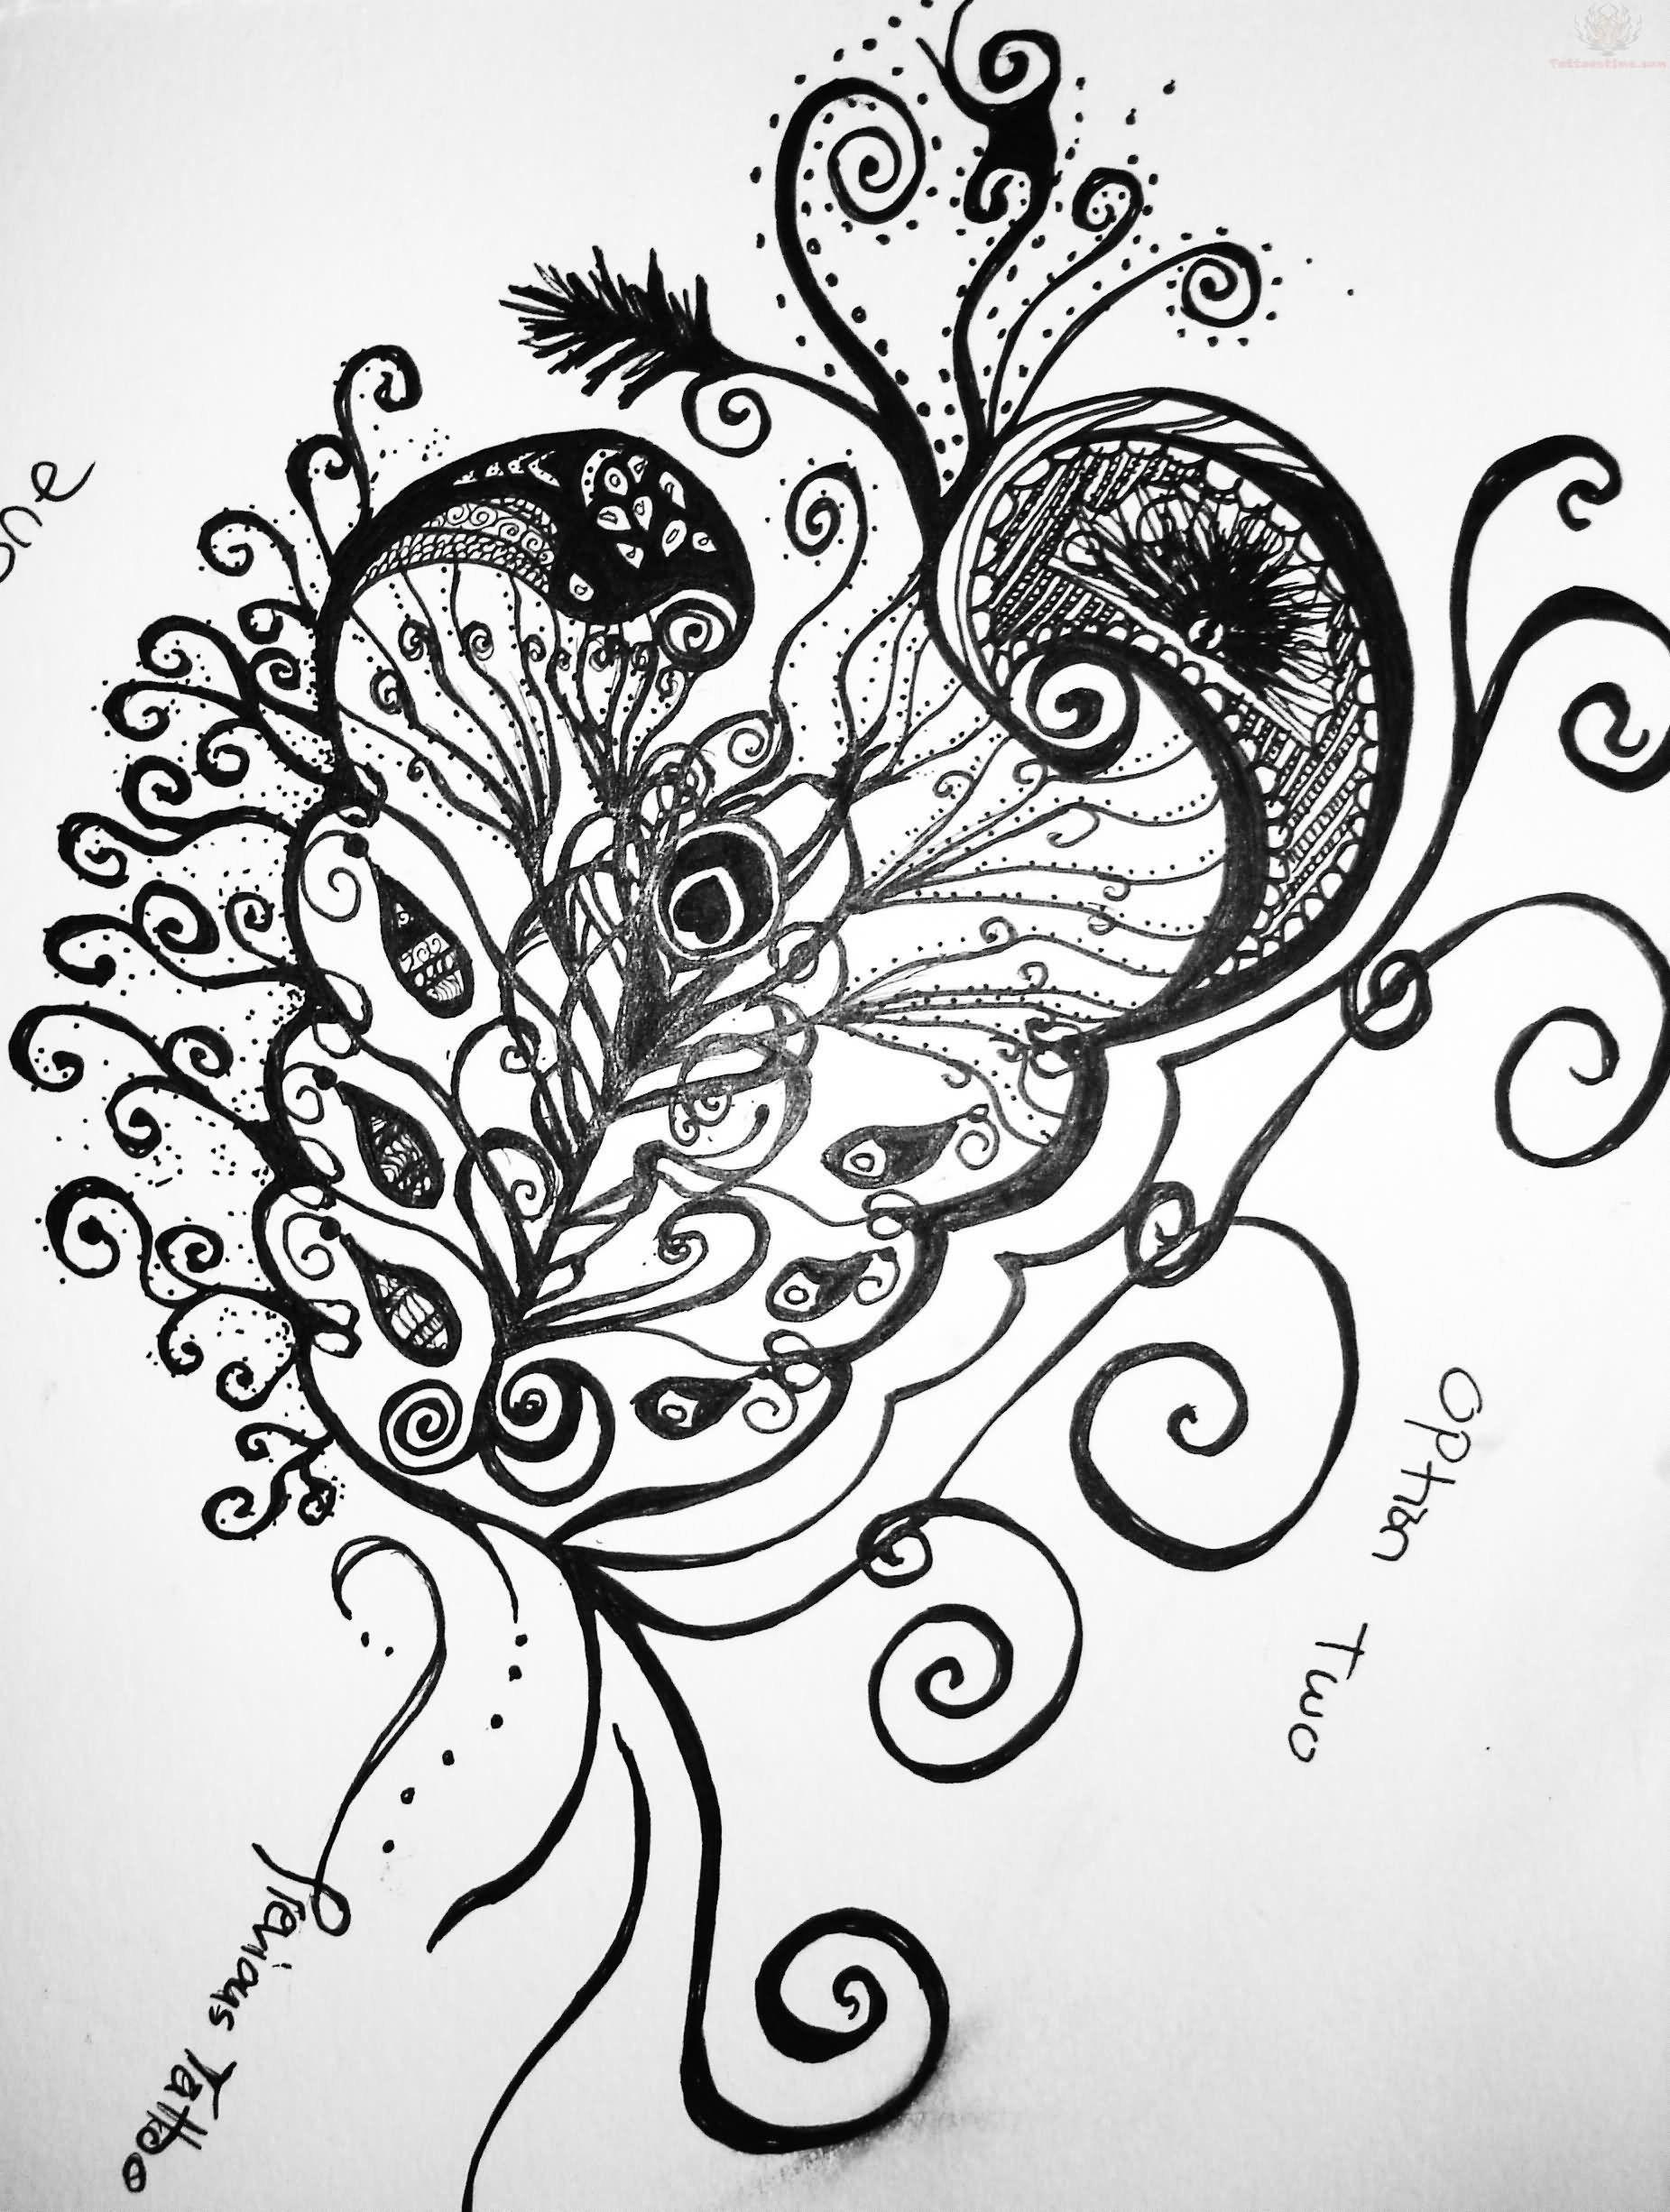 paisley pattern tattoo design tattoos pinterest paisley rh pinterest co uk Colorful Paisley Tattoo Ideas paisley tattoo small